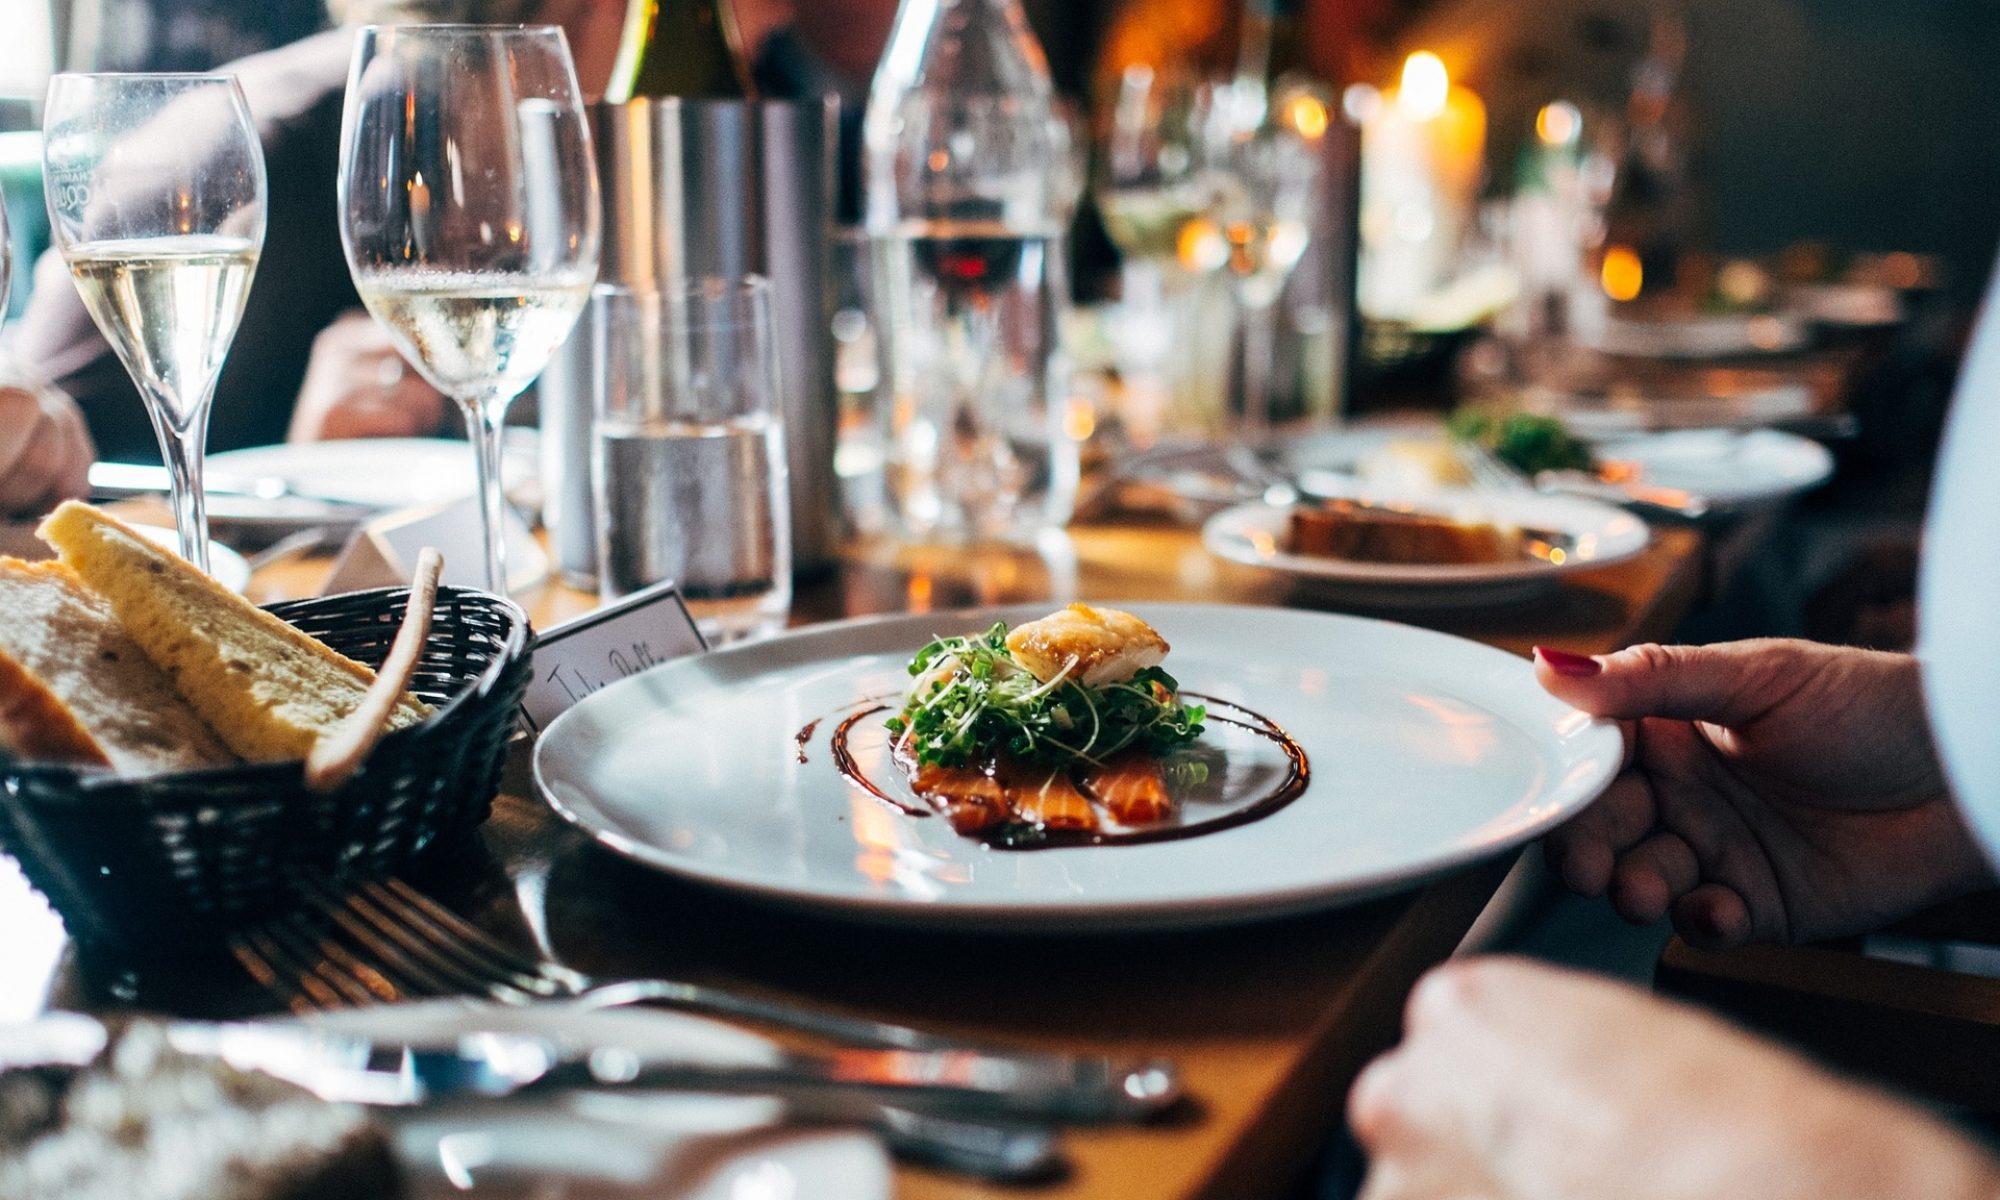 Hallingdal Catering AS